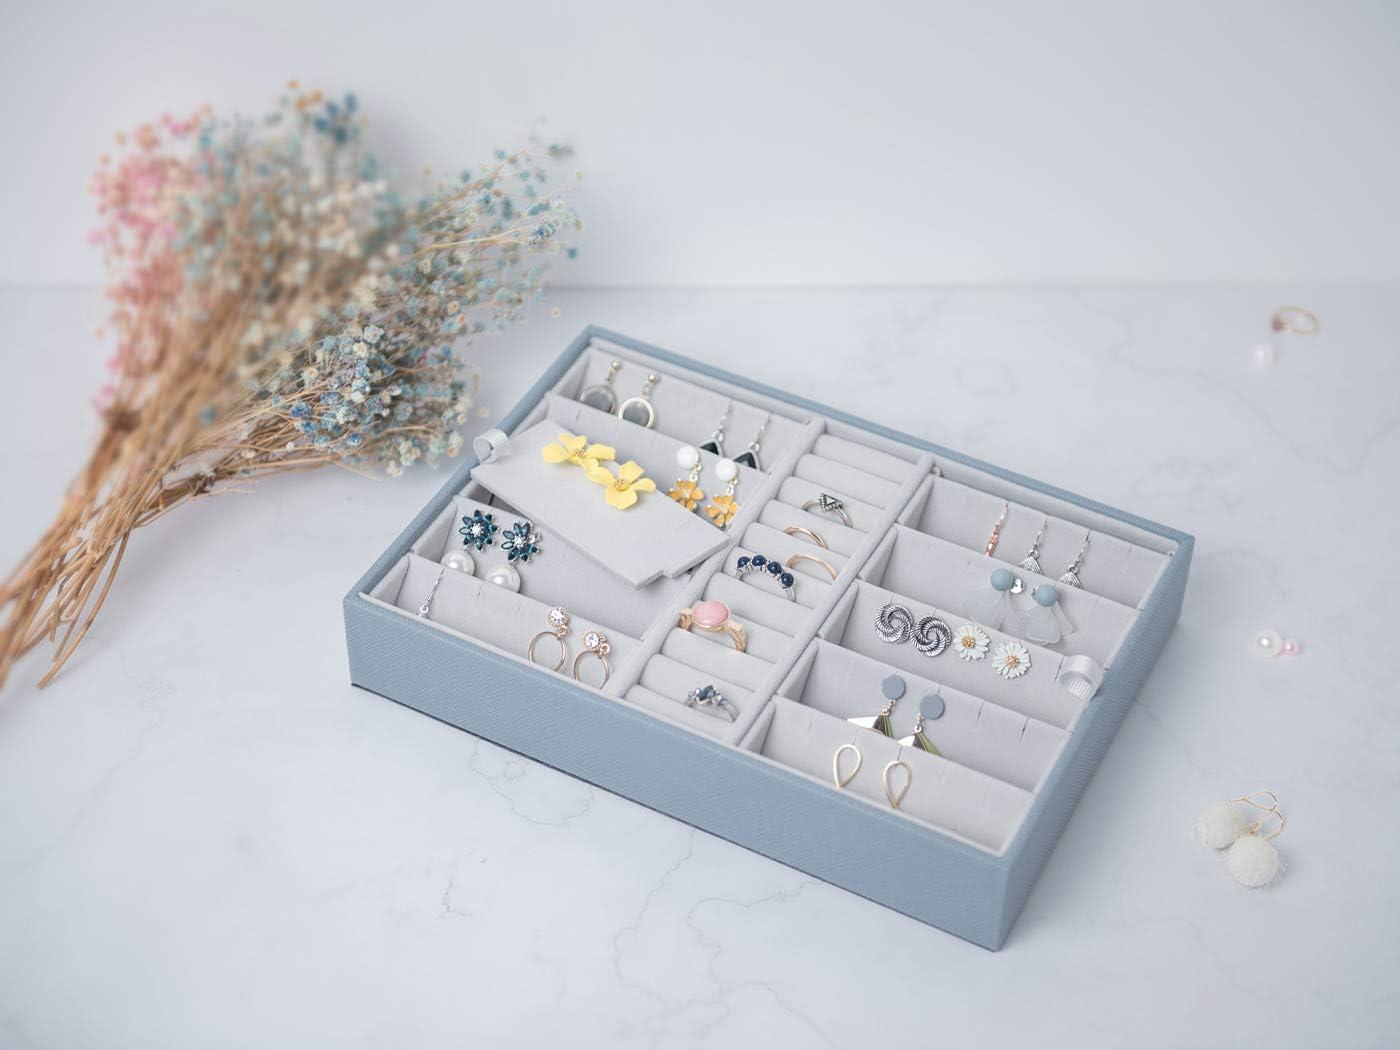 Two Layers Ring Earring Holder Secret Santa Gifts for Women Girls Earring Ring Fanatic-Blue X/•RHEA Earring Holder